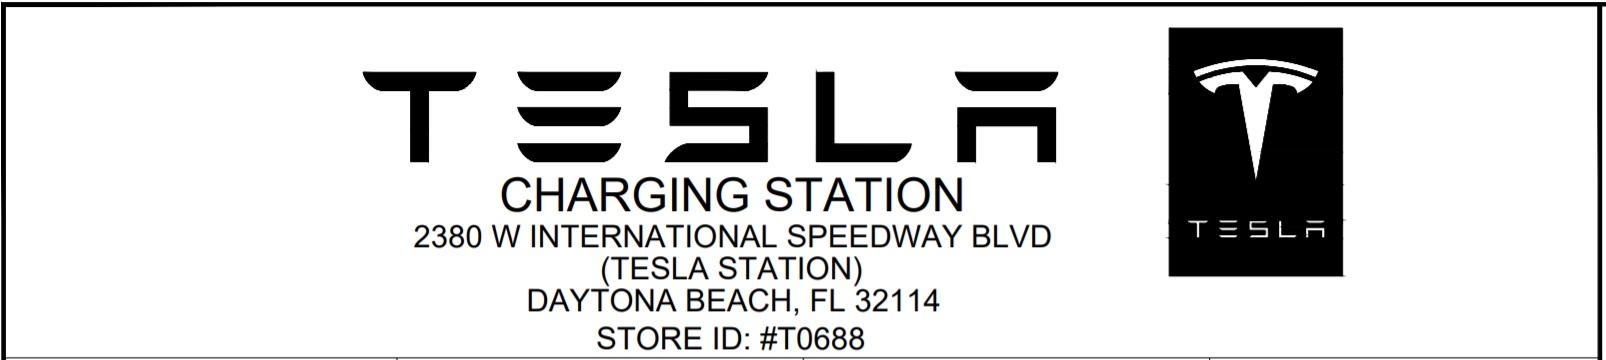 Daytona Beach Supercharger plans titile.jpg